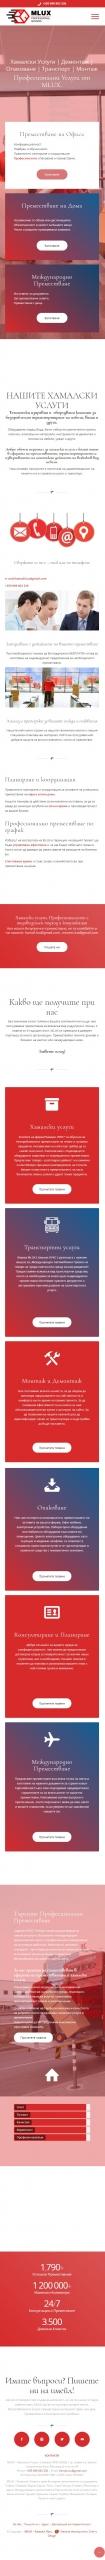 Apps, Mobile-MLUX-CherryDesign